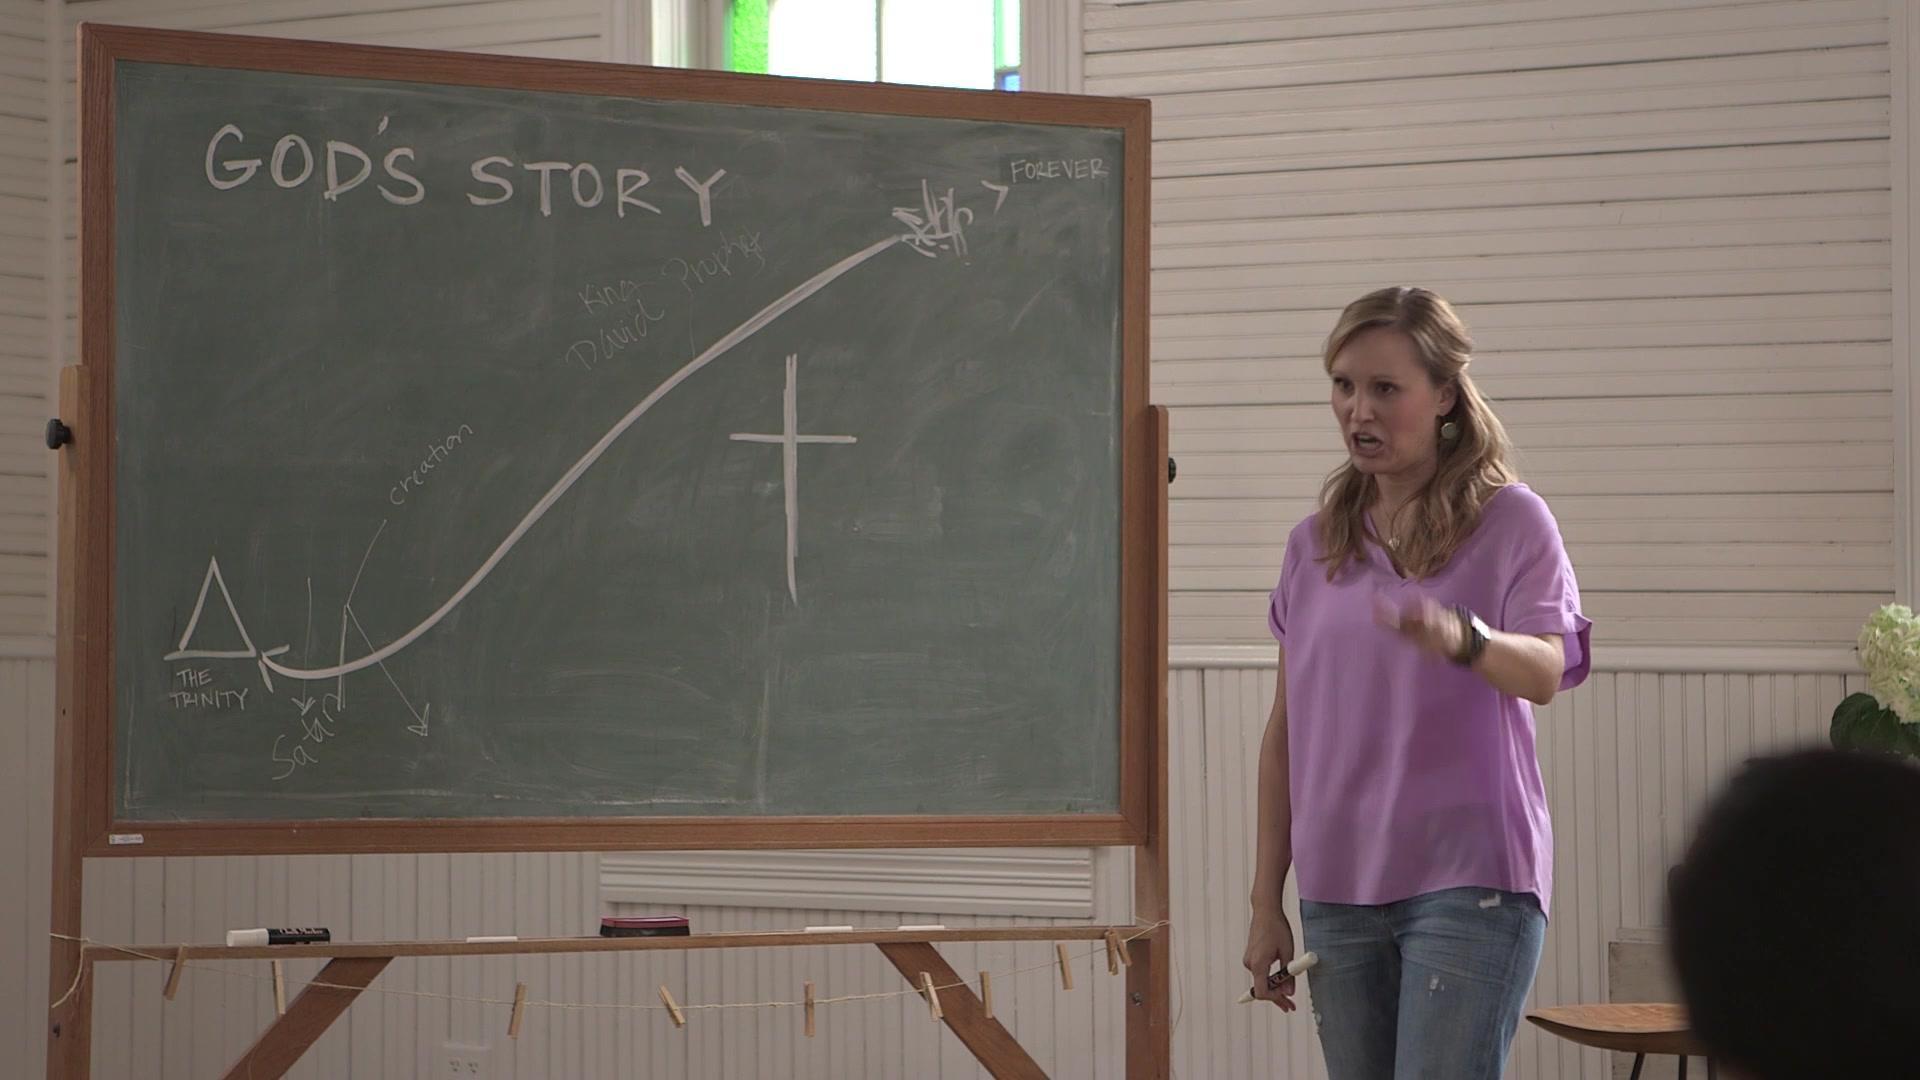 Restless Study Week 2 — God's Story - FaithGateway